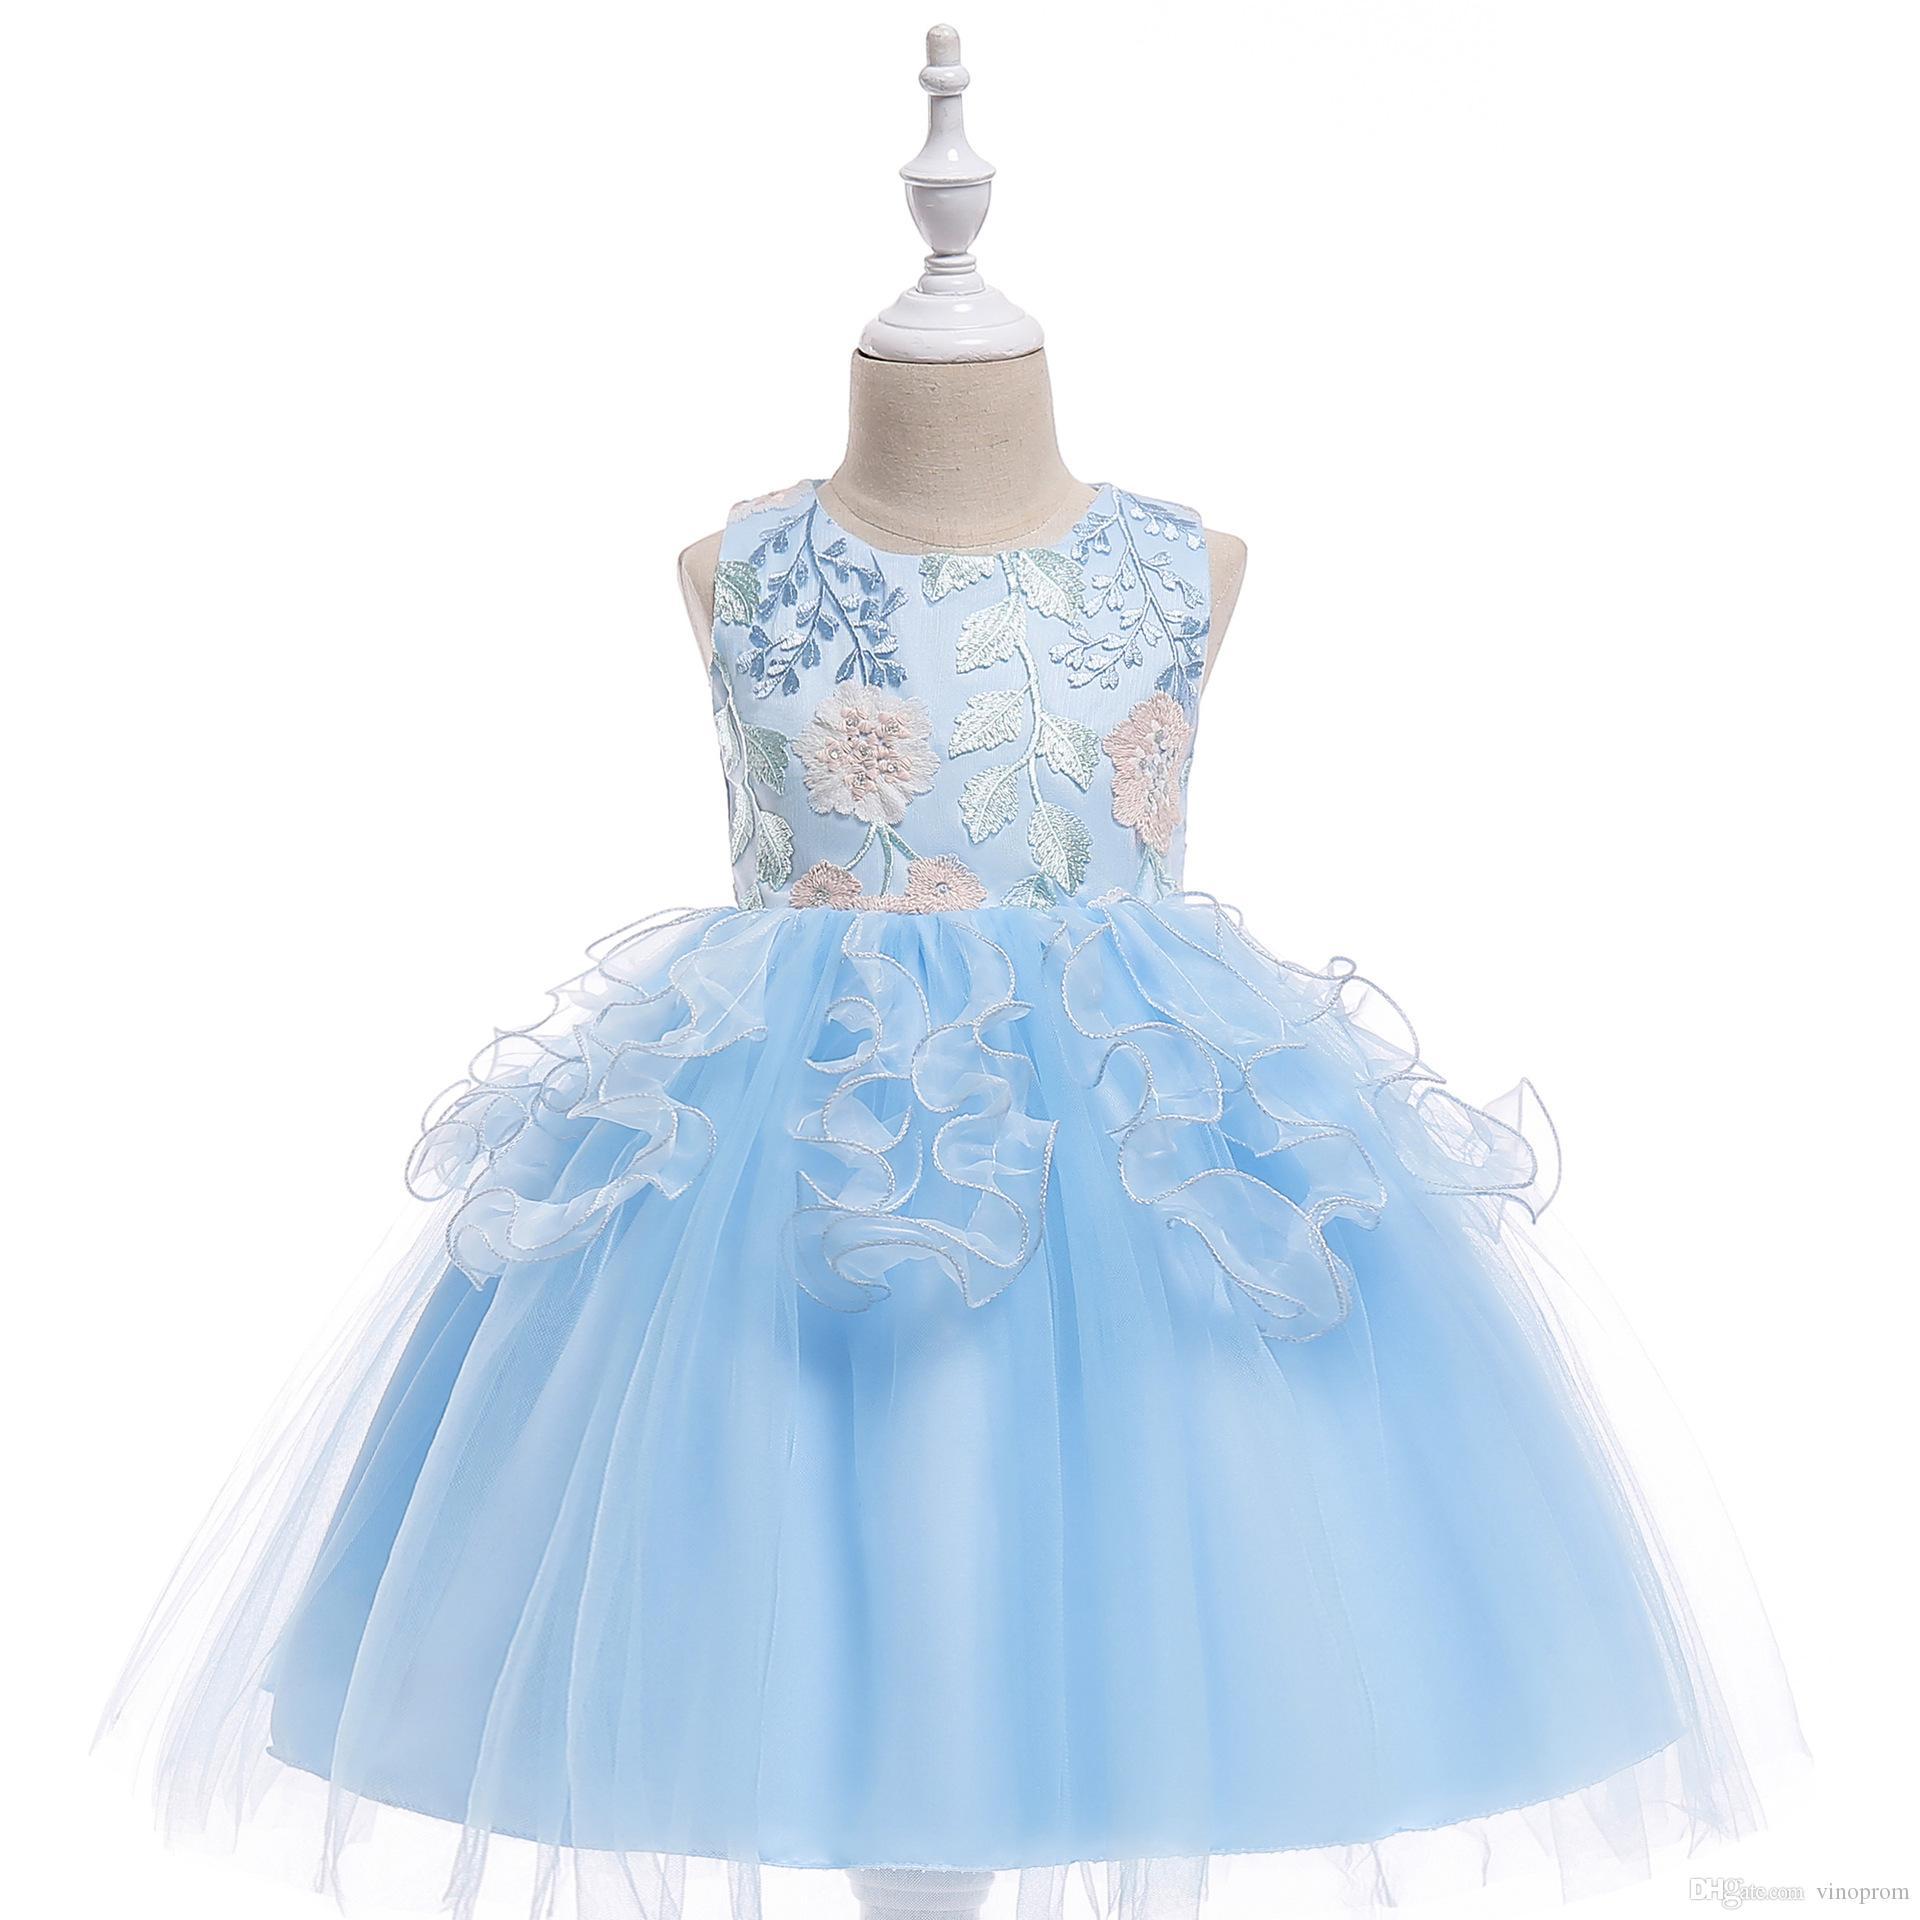 Kids Formal Wear Embroidery Flower Girls Dresses With Rhinestone Ruffled Elegant Children Evening Prom Long Dres